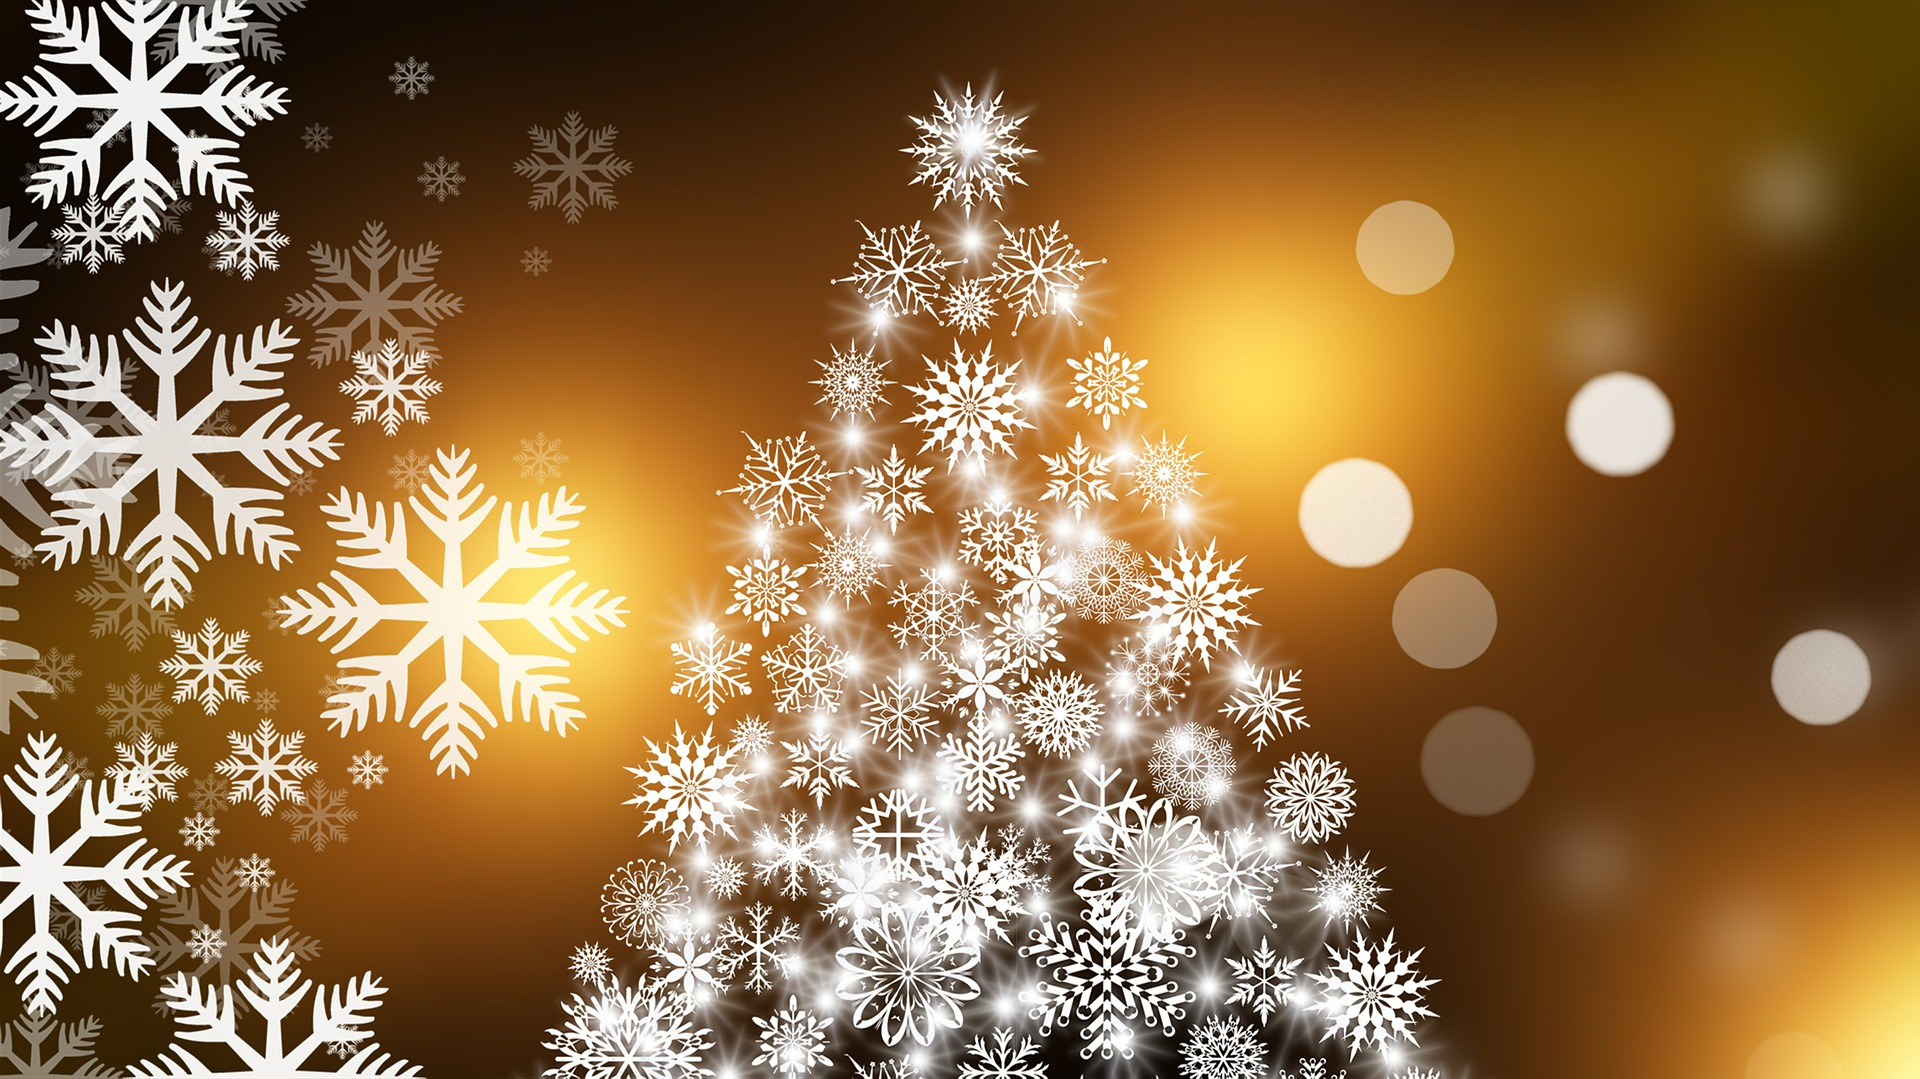 Sfondo Natalizio - Sfondi natalizi gratis albero